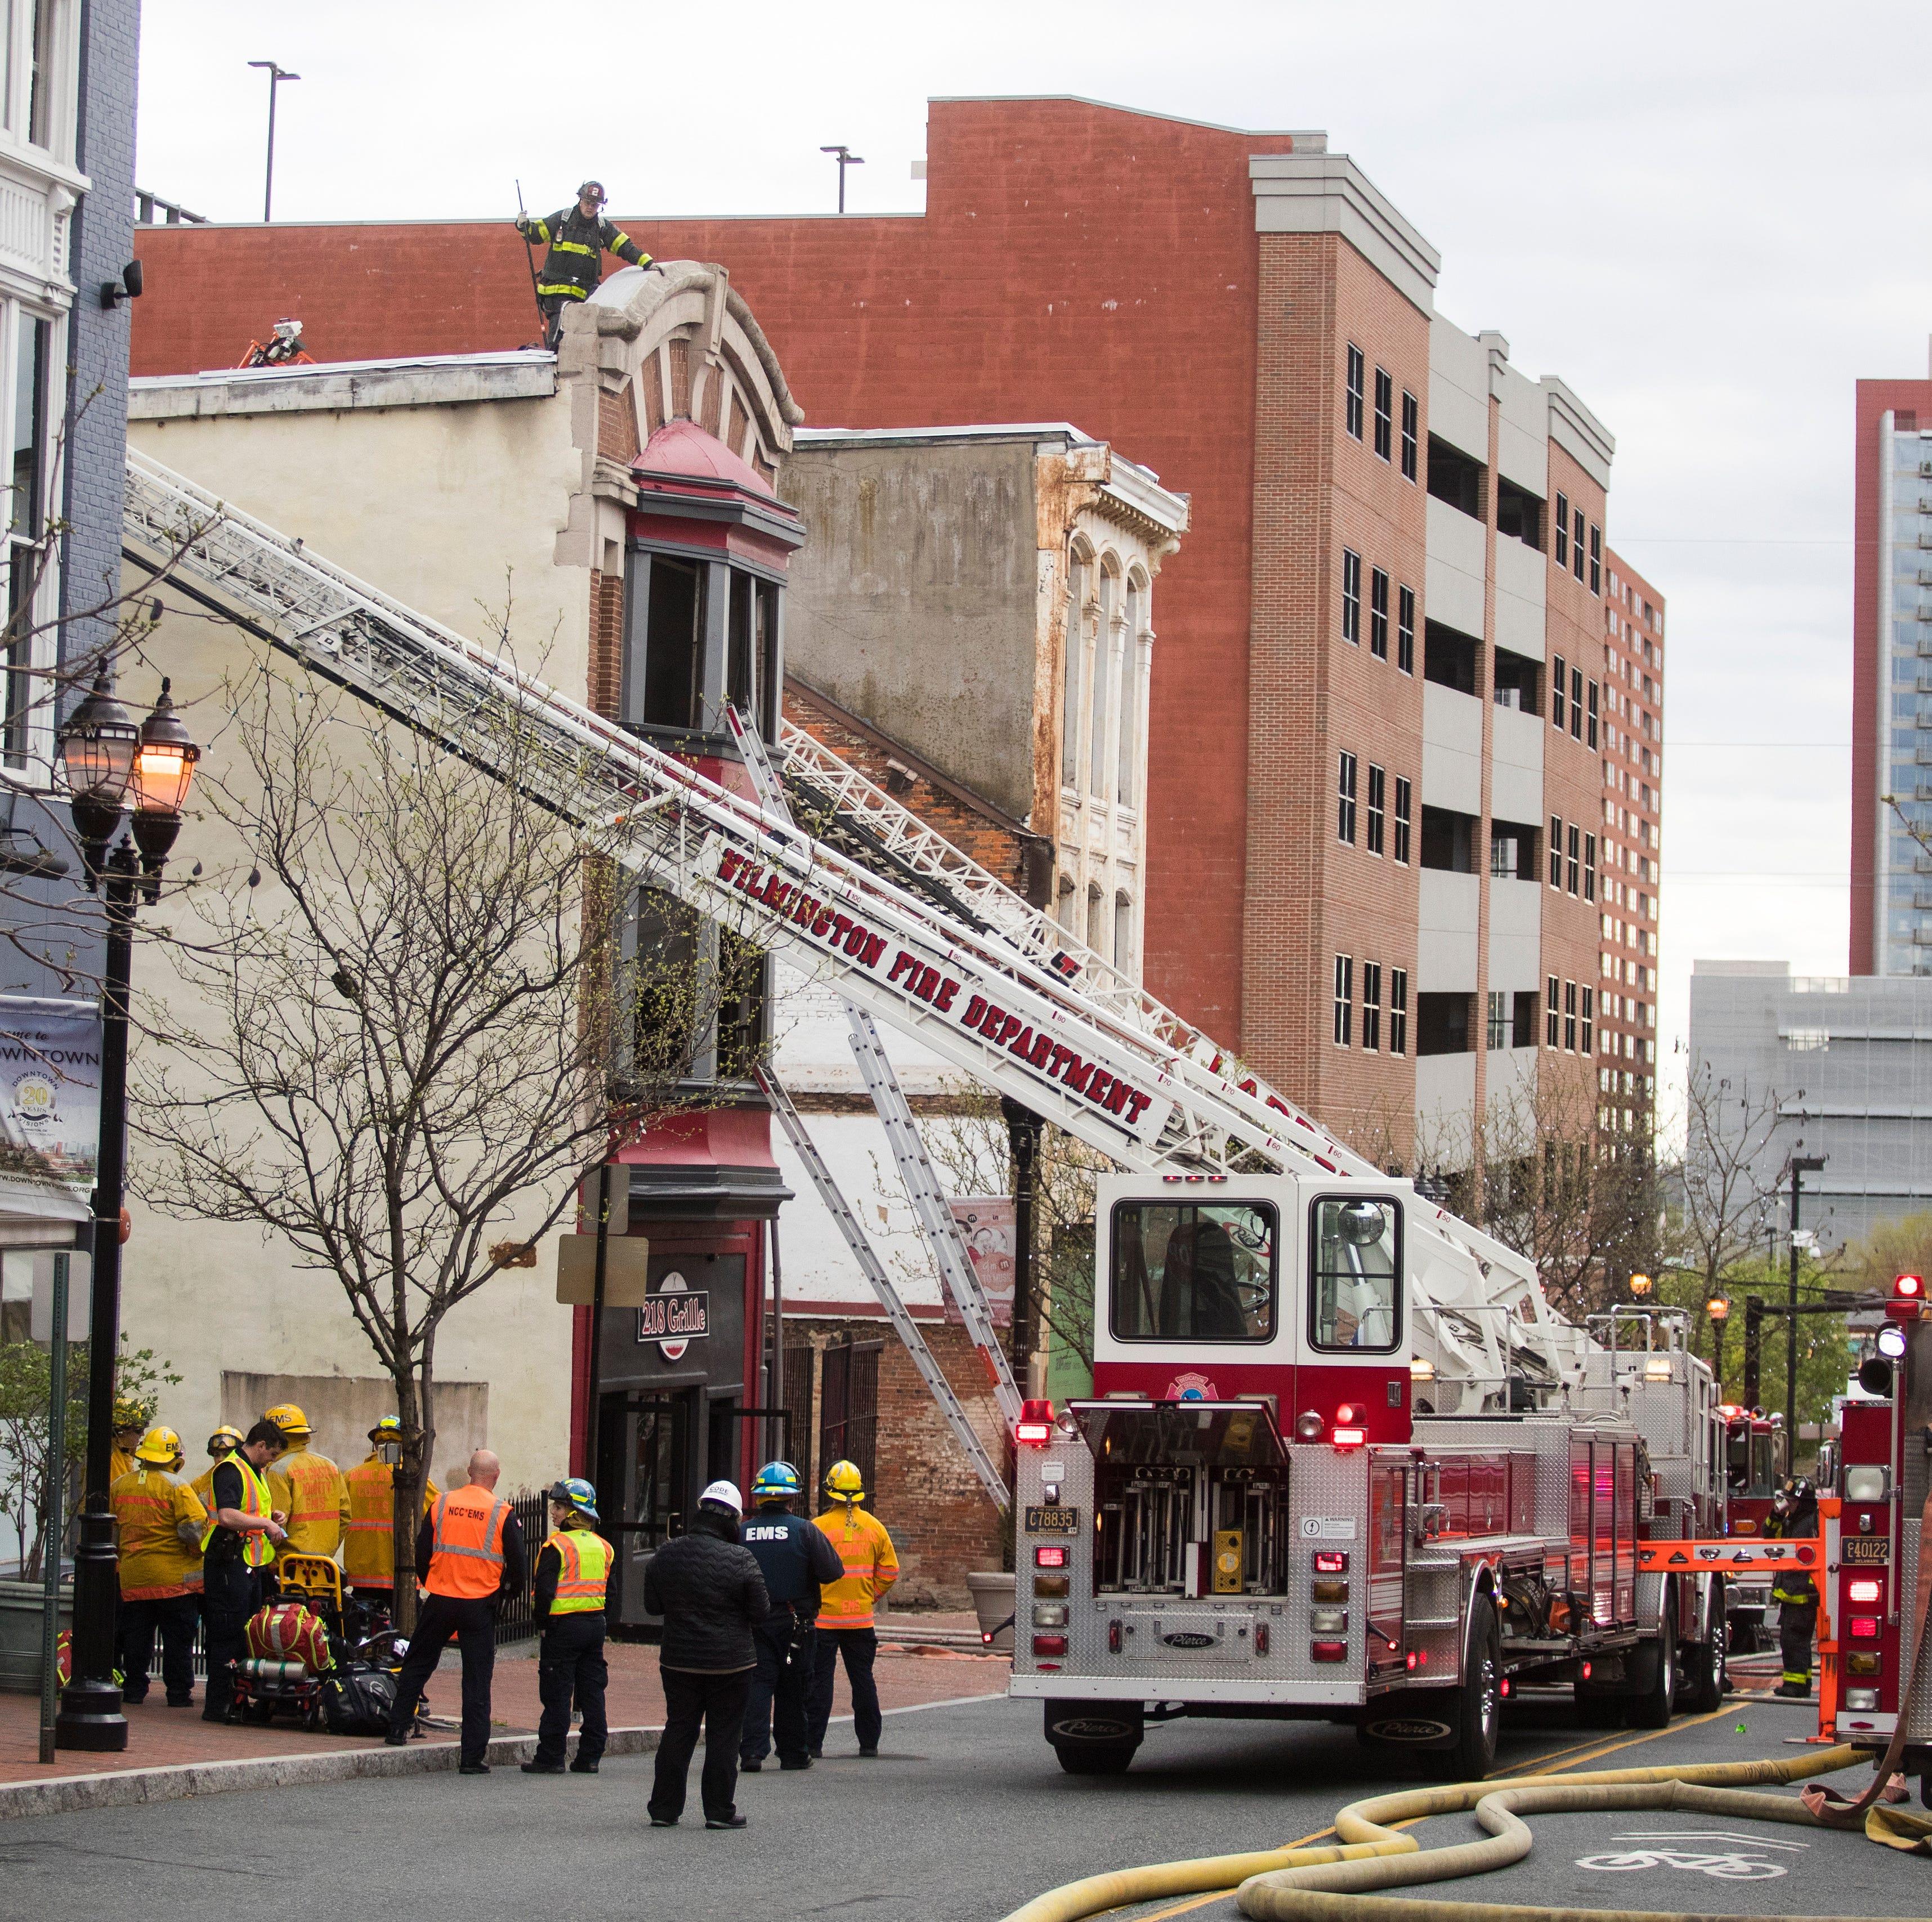 Restaurant fire shuts down Market Street